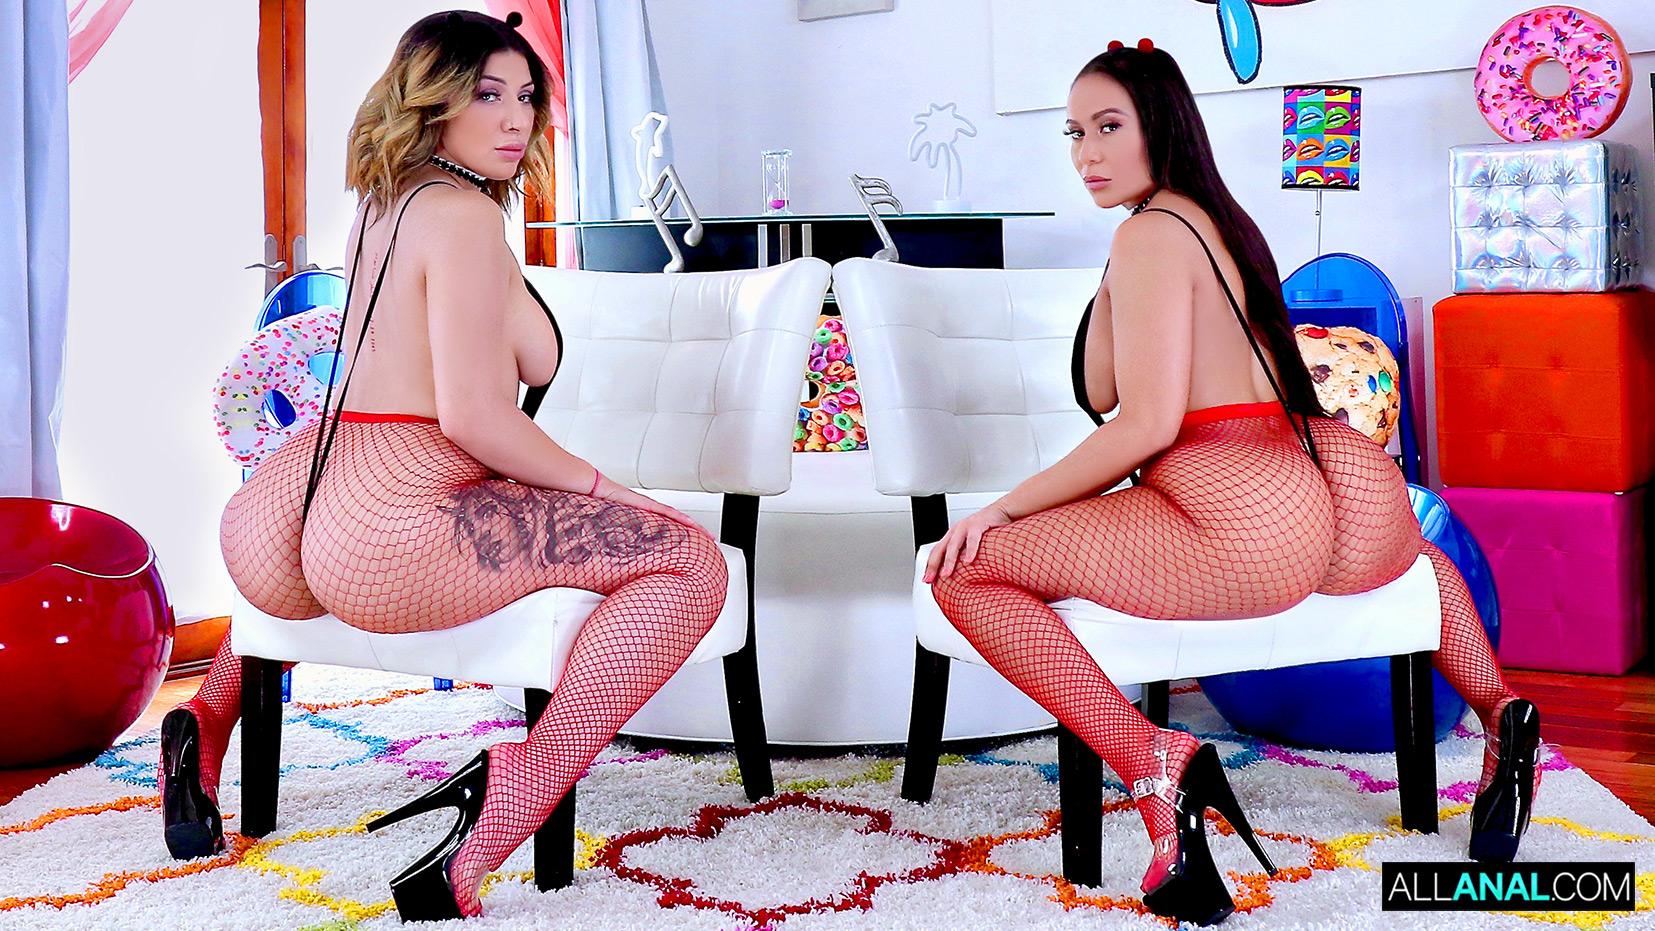 AllAnal.com - Big Booty Madness with Valentina and Carmela